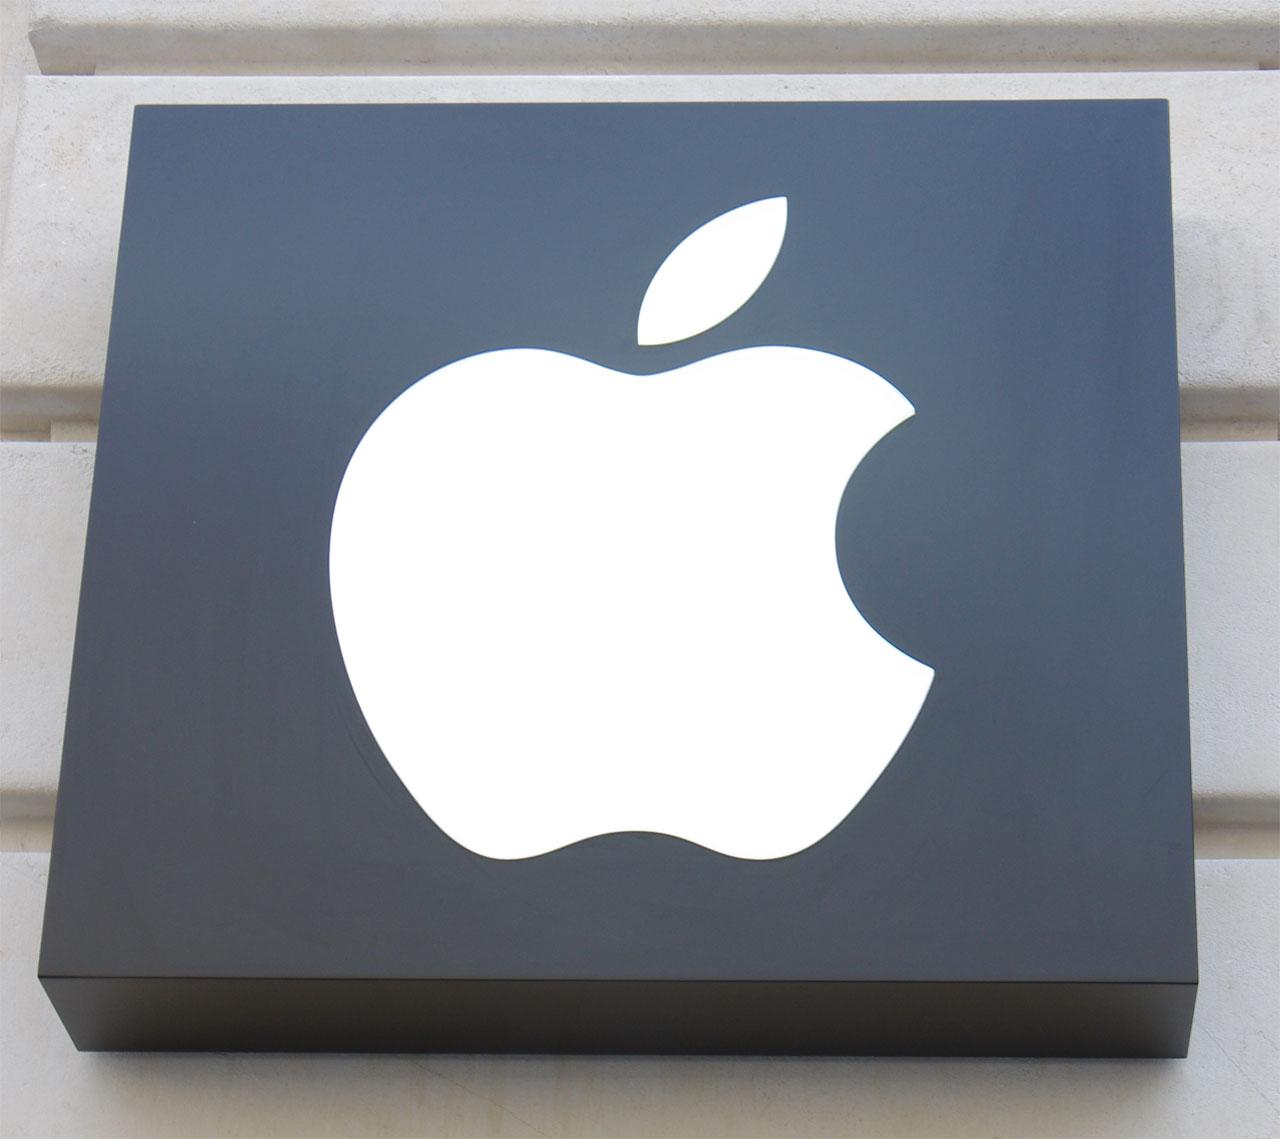 Apple app store logo Wallpaper